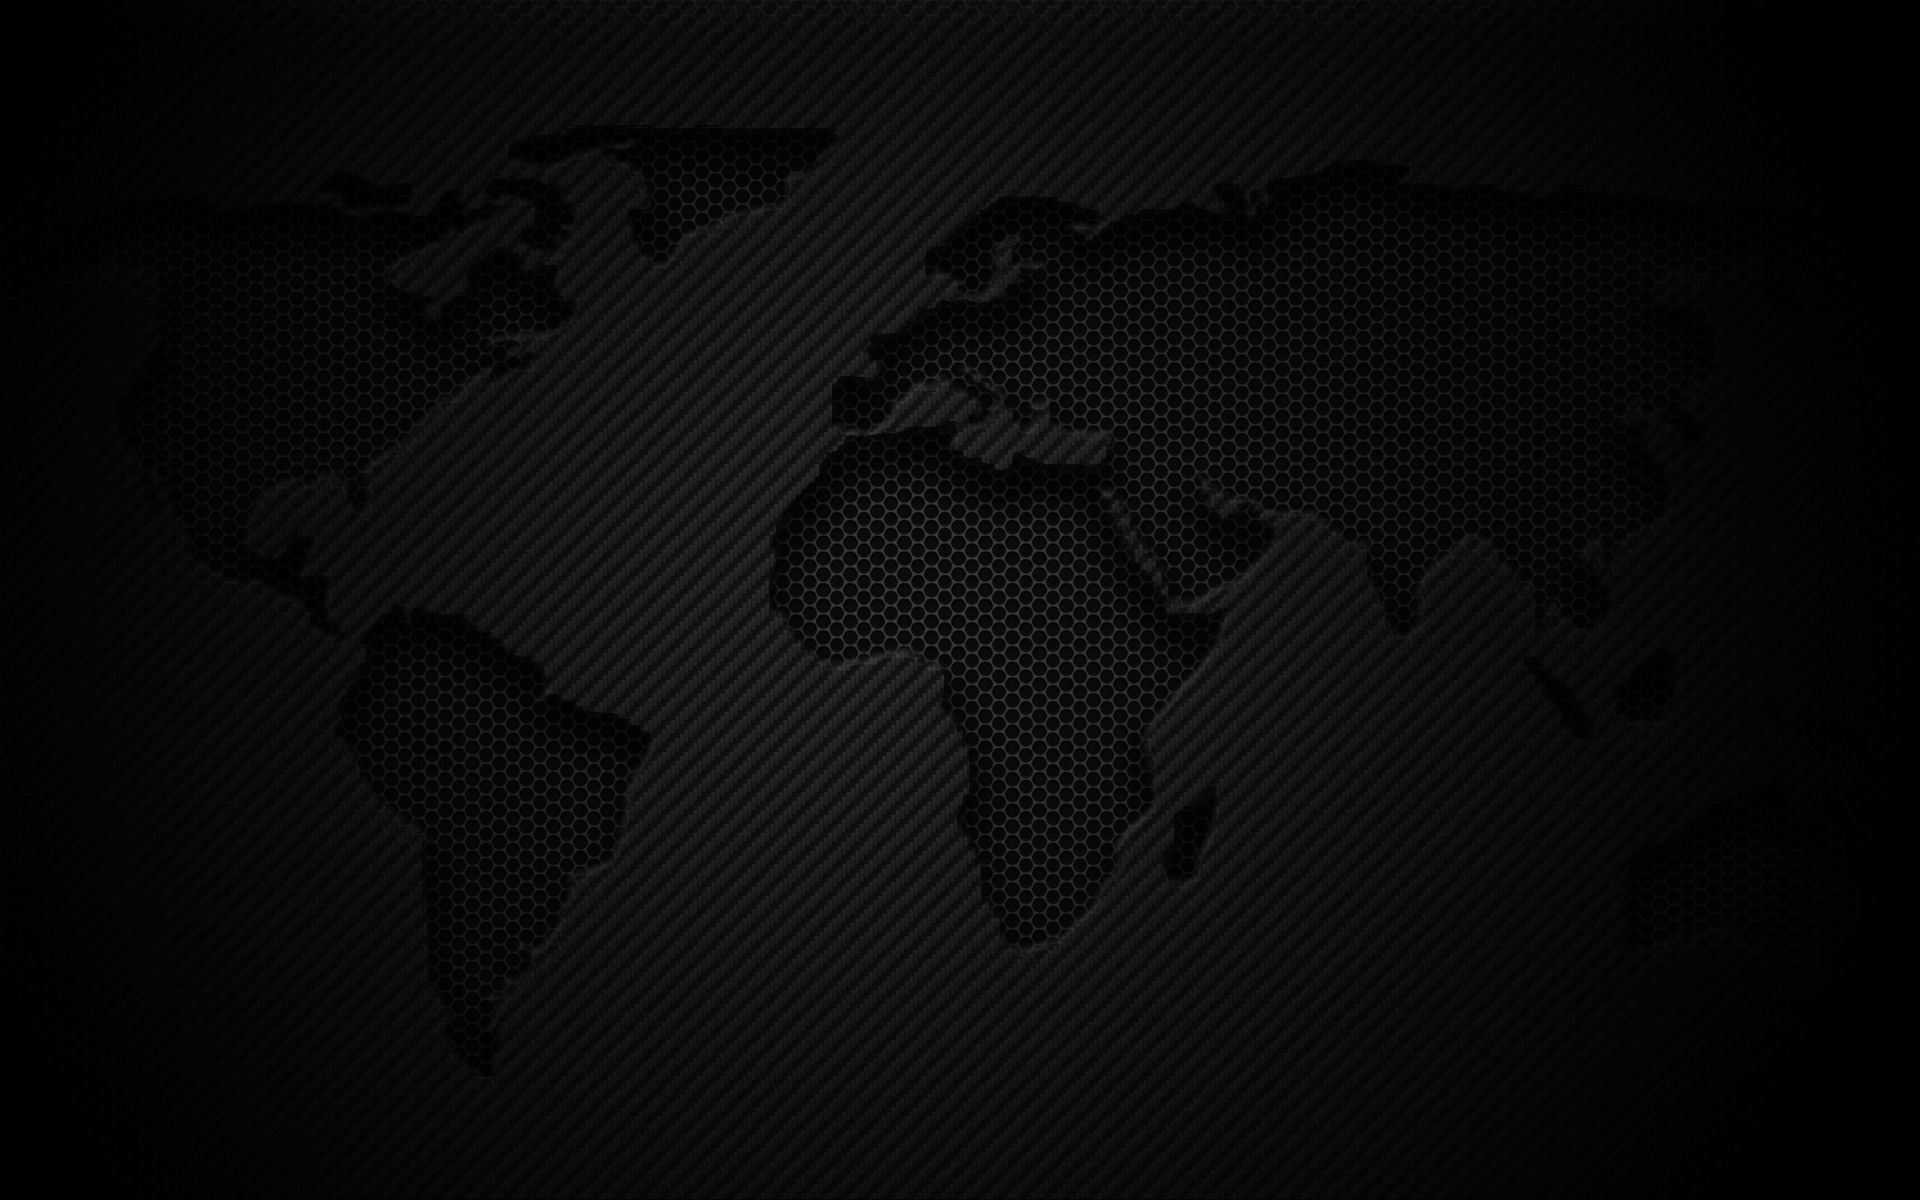 4K Ultra HD Dark Wallpapers Top Free 4K Ultra HD Dark